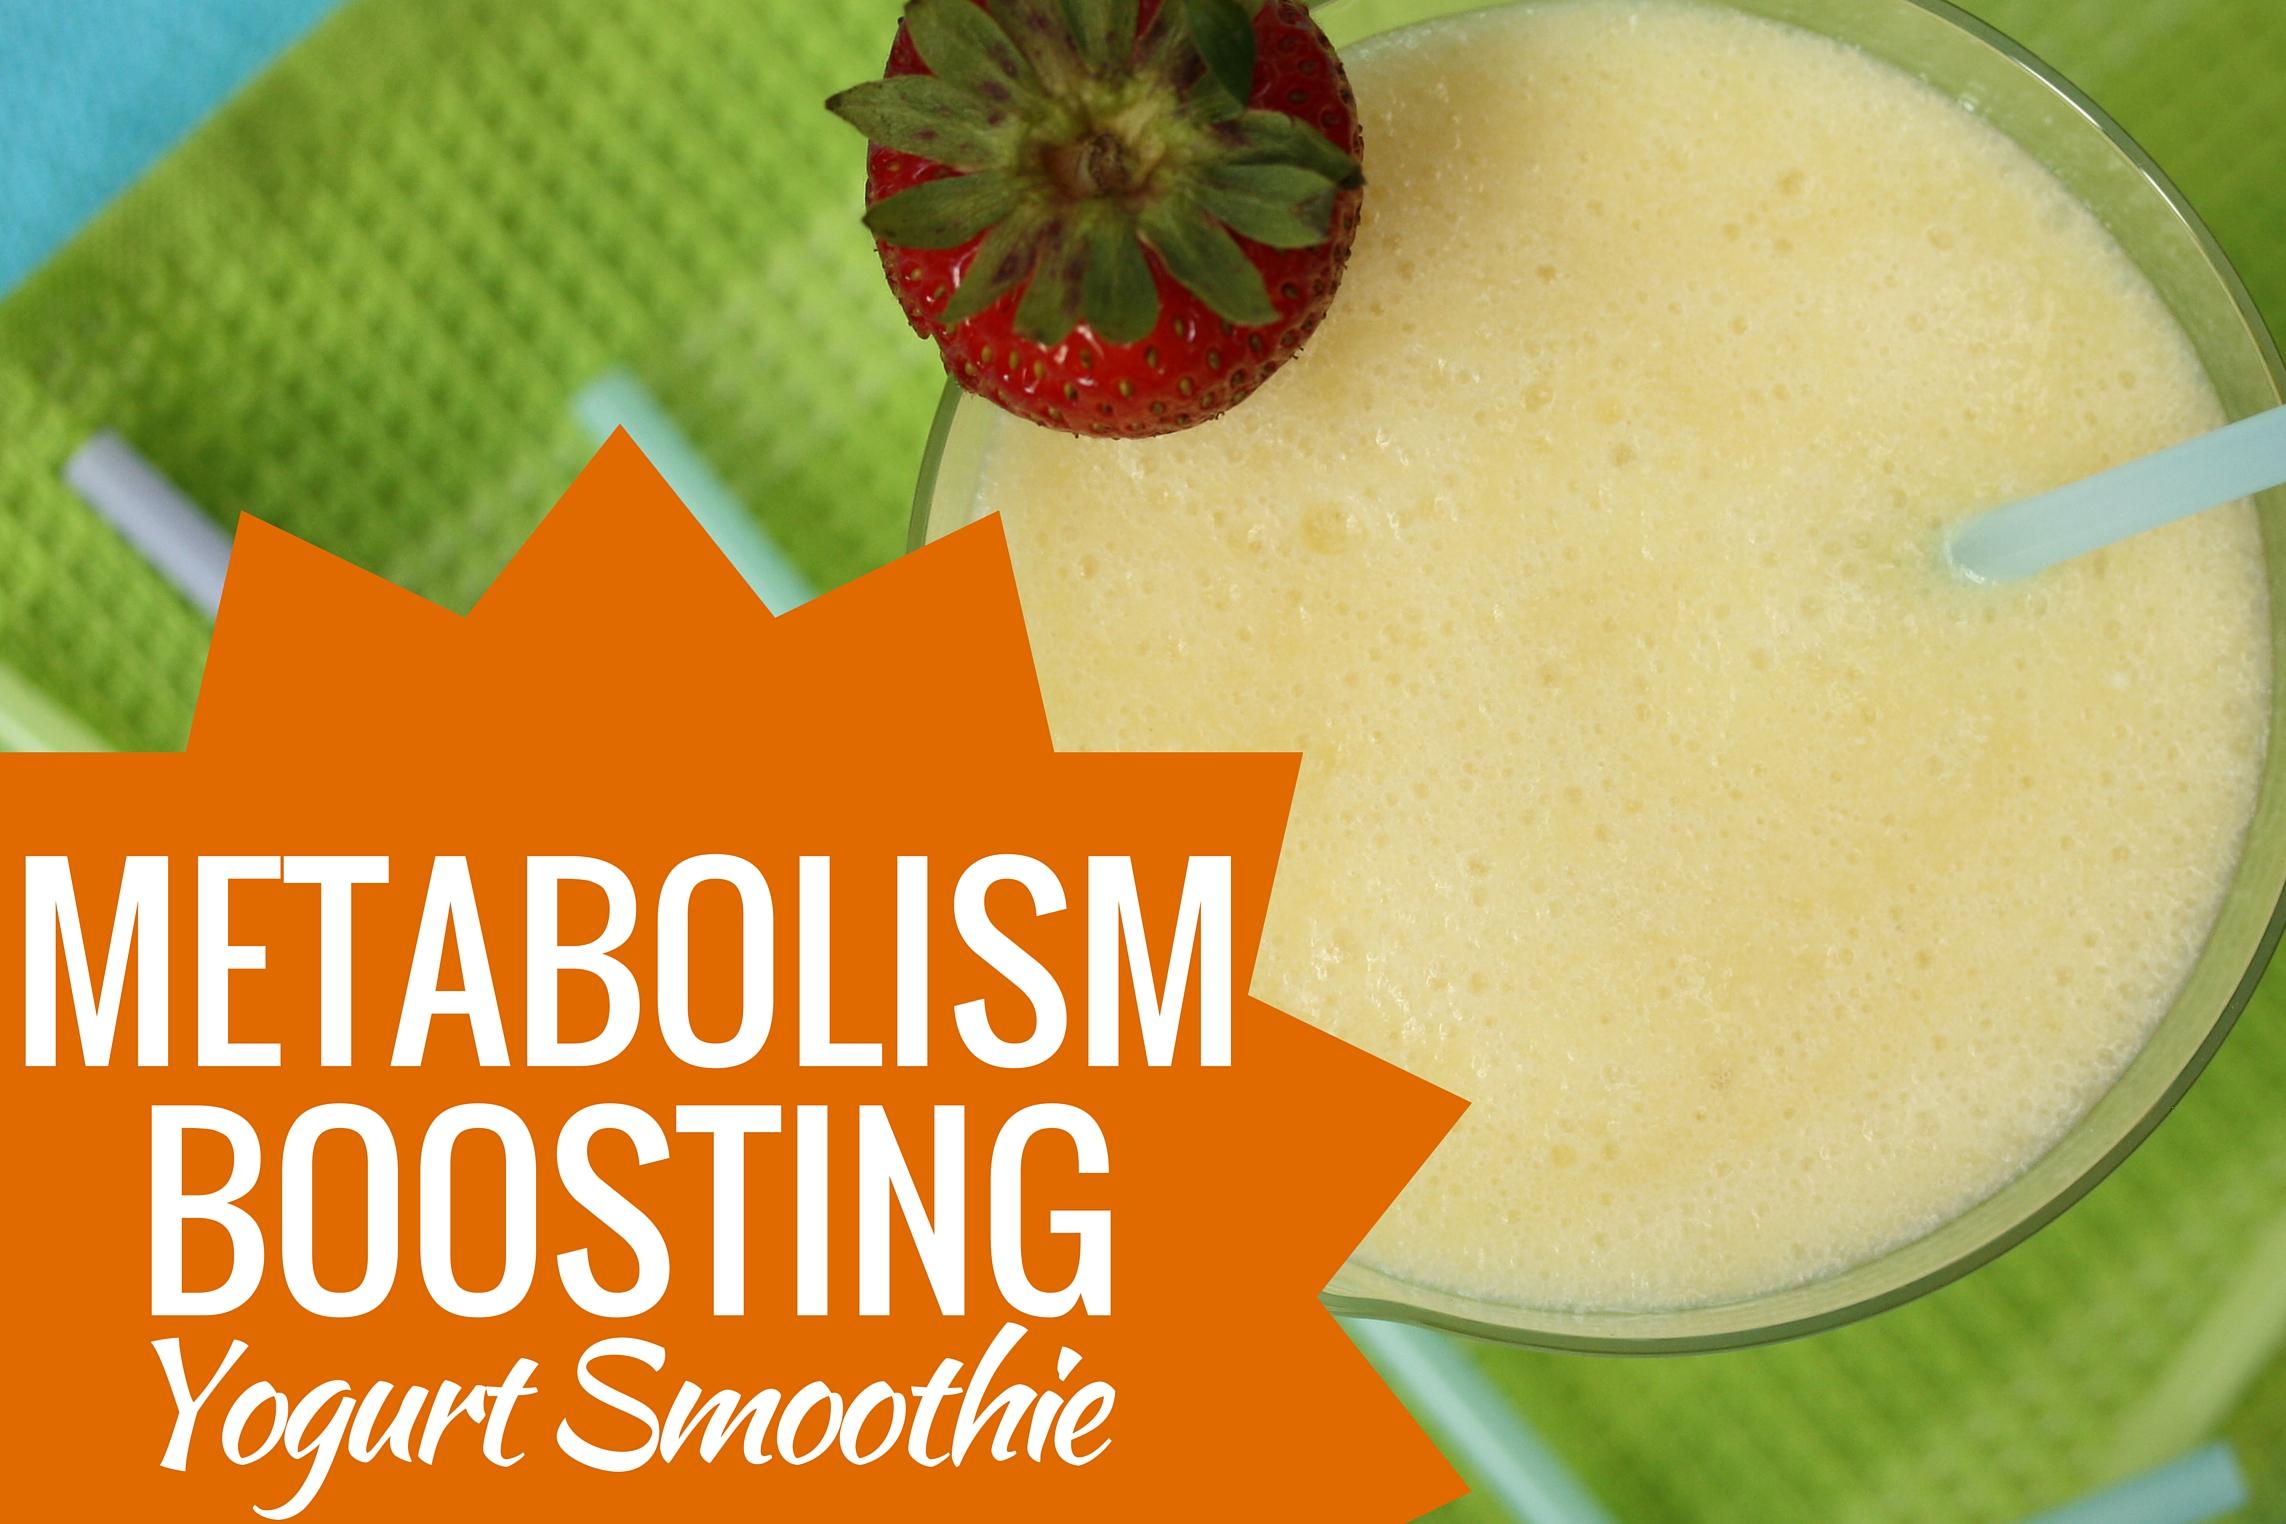 Metabolism Boosting Yogurt Smoothie